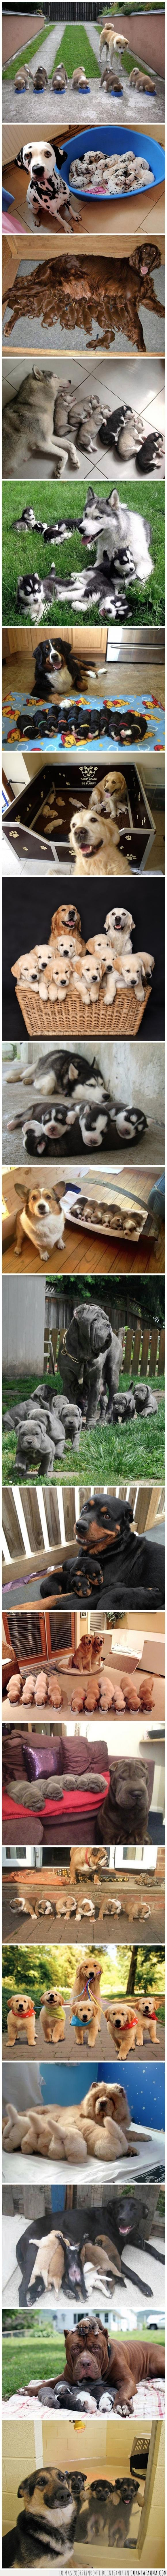 amor,cachorros,camada,familia,madre,orgullo,orgulloso,padre,perros